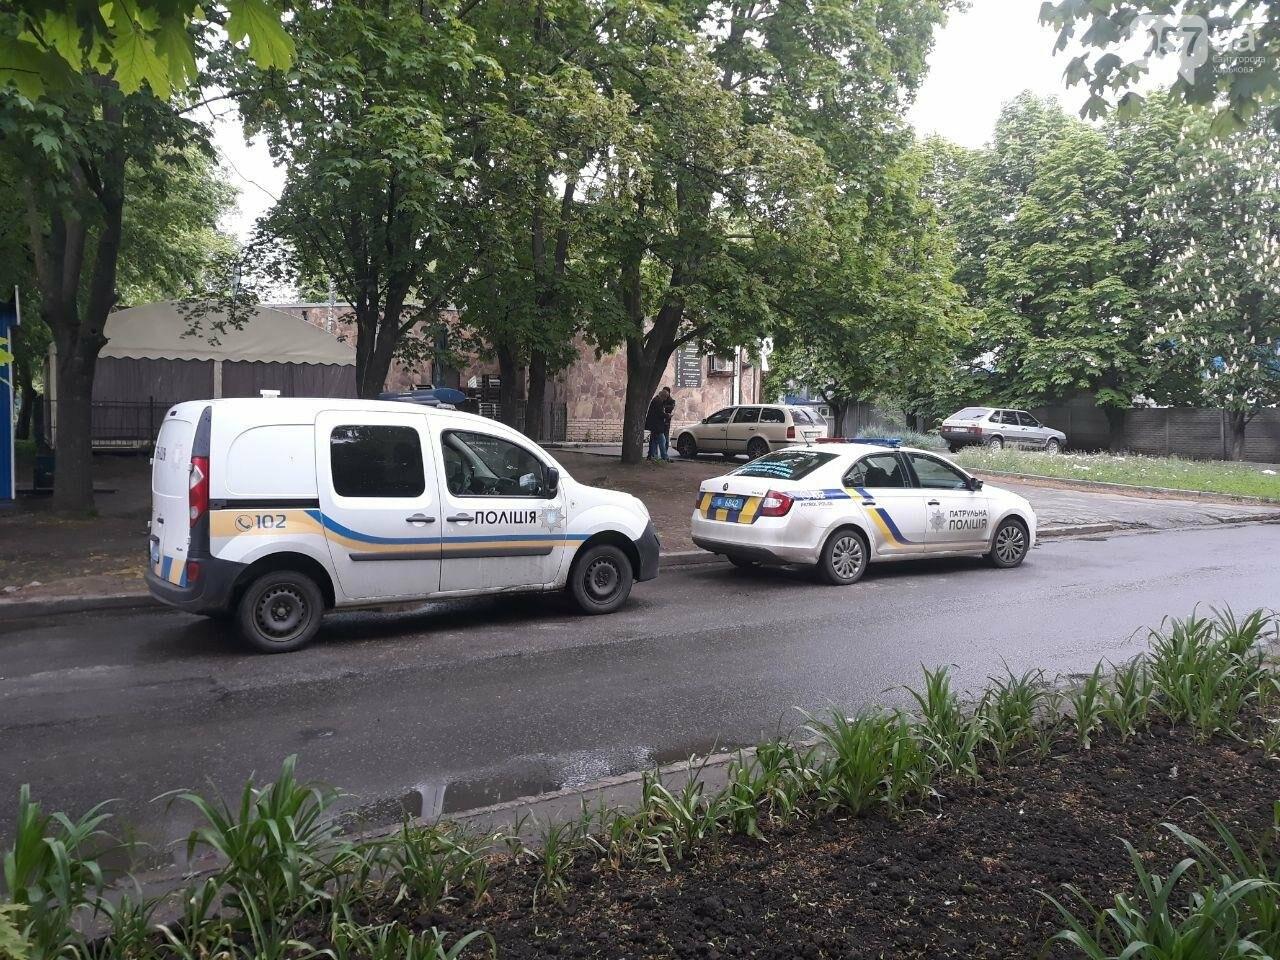 В Харькове силовики оцепили «пятиэтажку» и искали взрывчатку, - ФОТО, фото-9